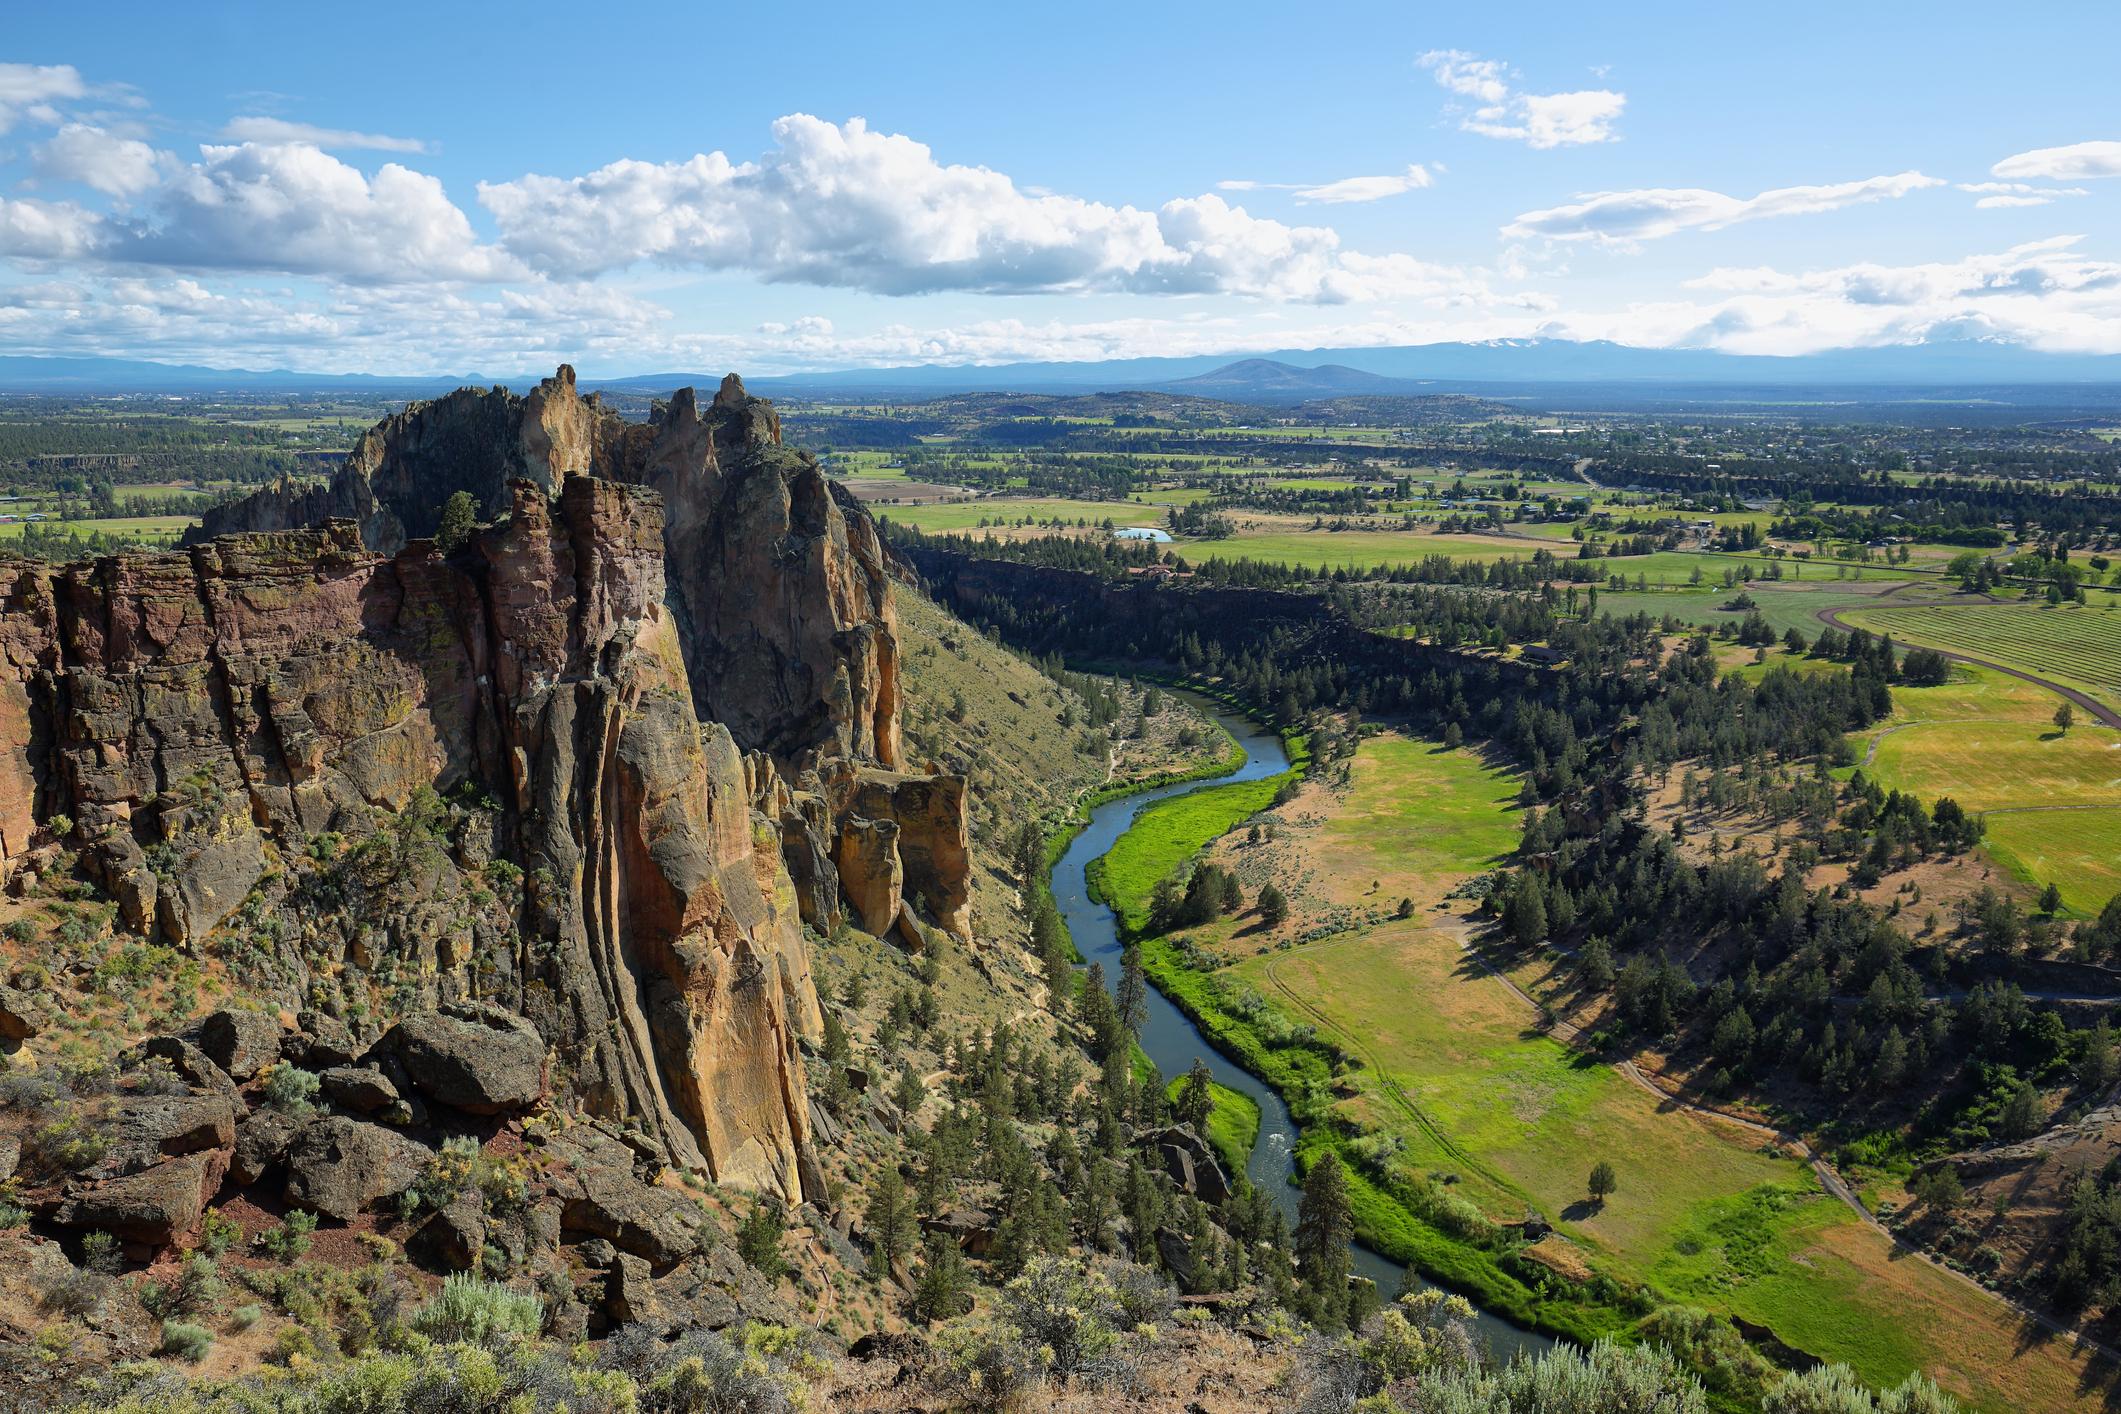 Sheer rock faces overlook a winding river.